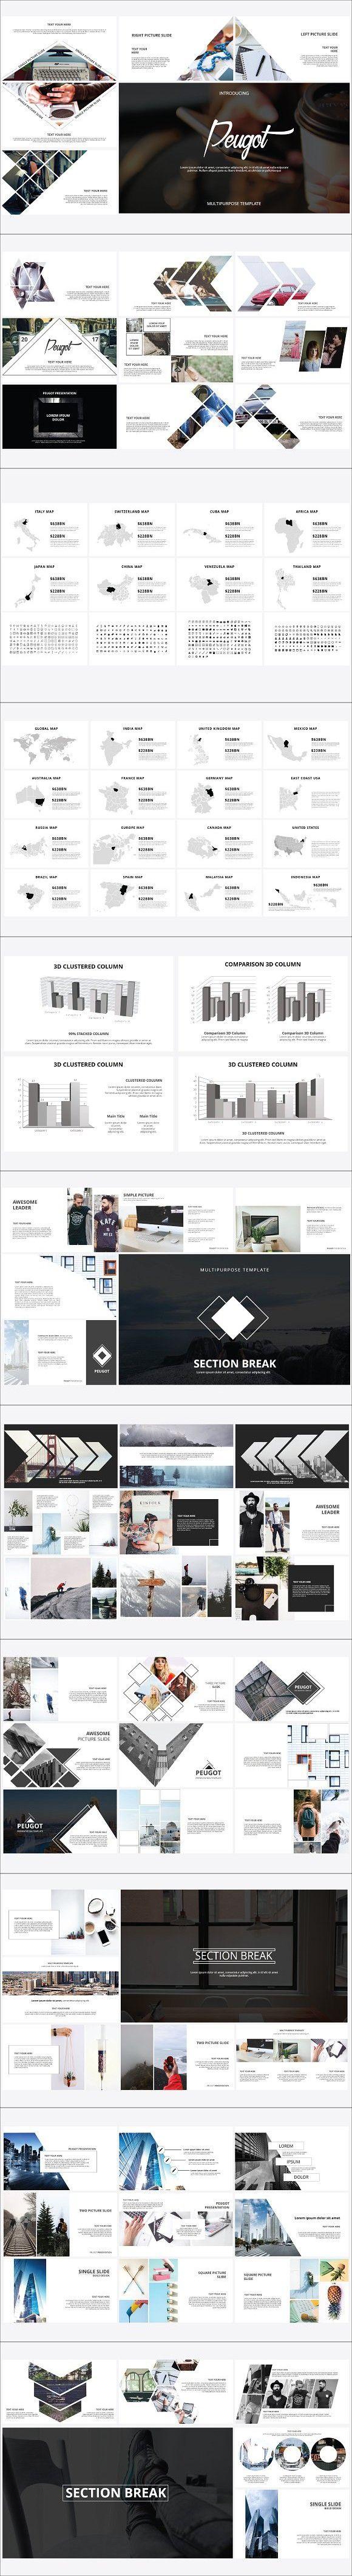 83 best Powerpoint images on Pinterest | Minimalist, Powerpoint ...